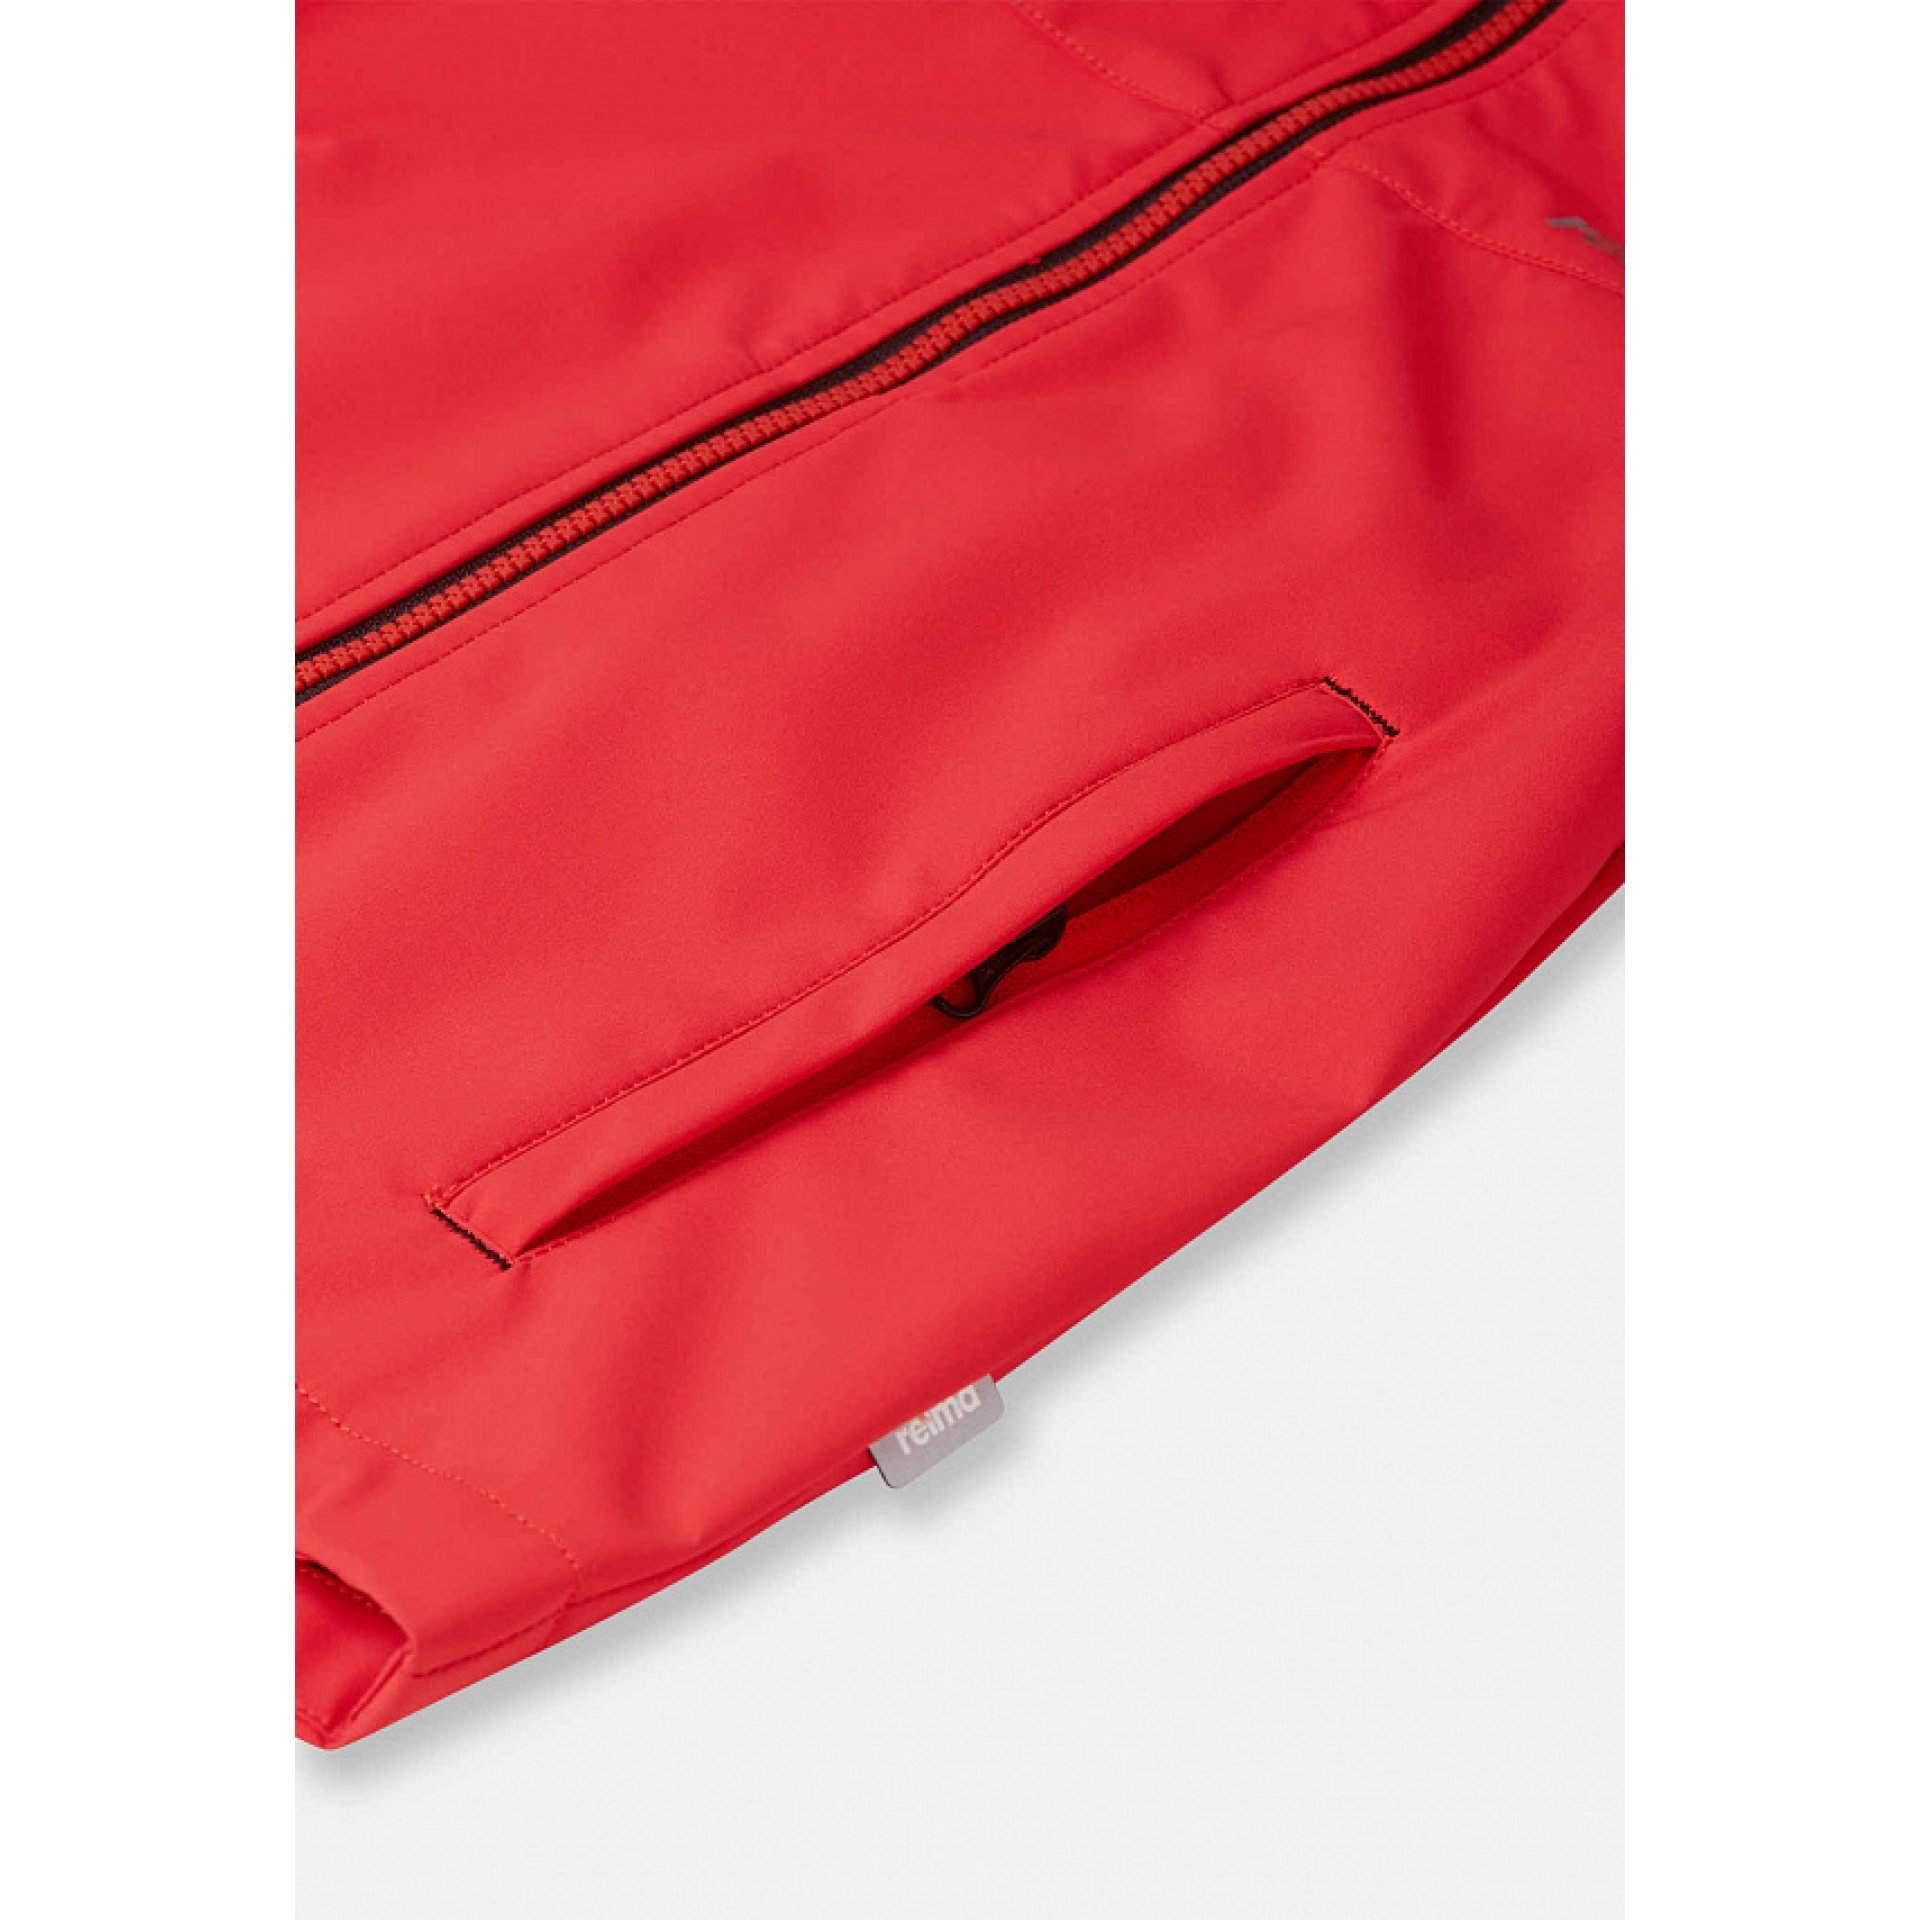 KURTKA REIMA KUOPIO 531509-3880 TOMATO RED KIESZEŃ